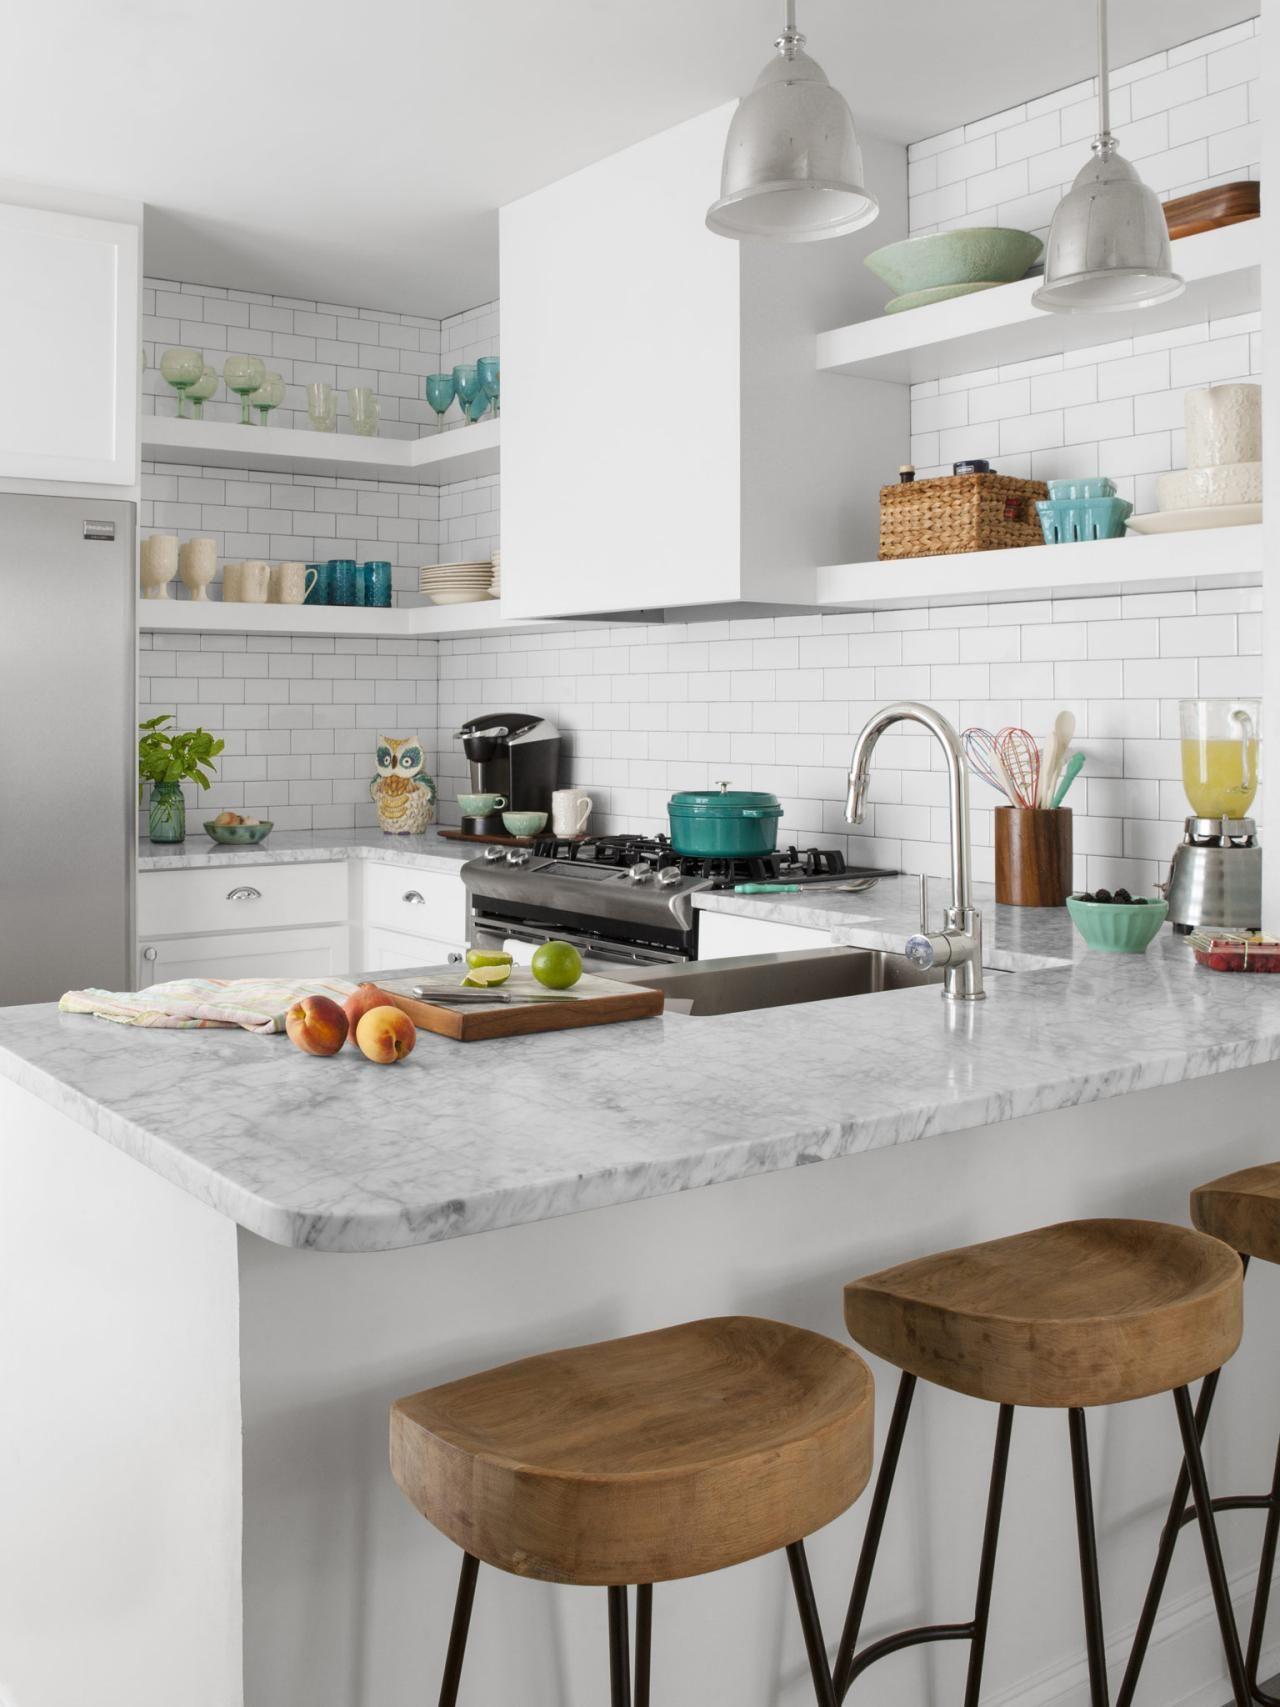 White Kitchen Islands   Kitchen remodel small, Small space kitchen ...